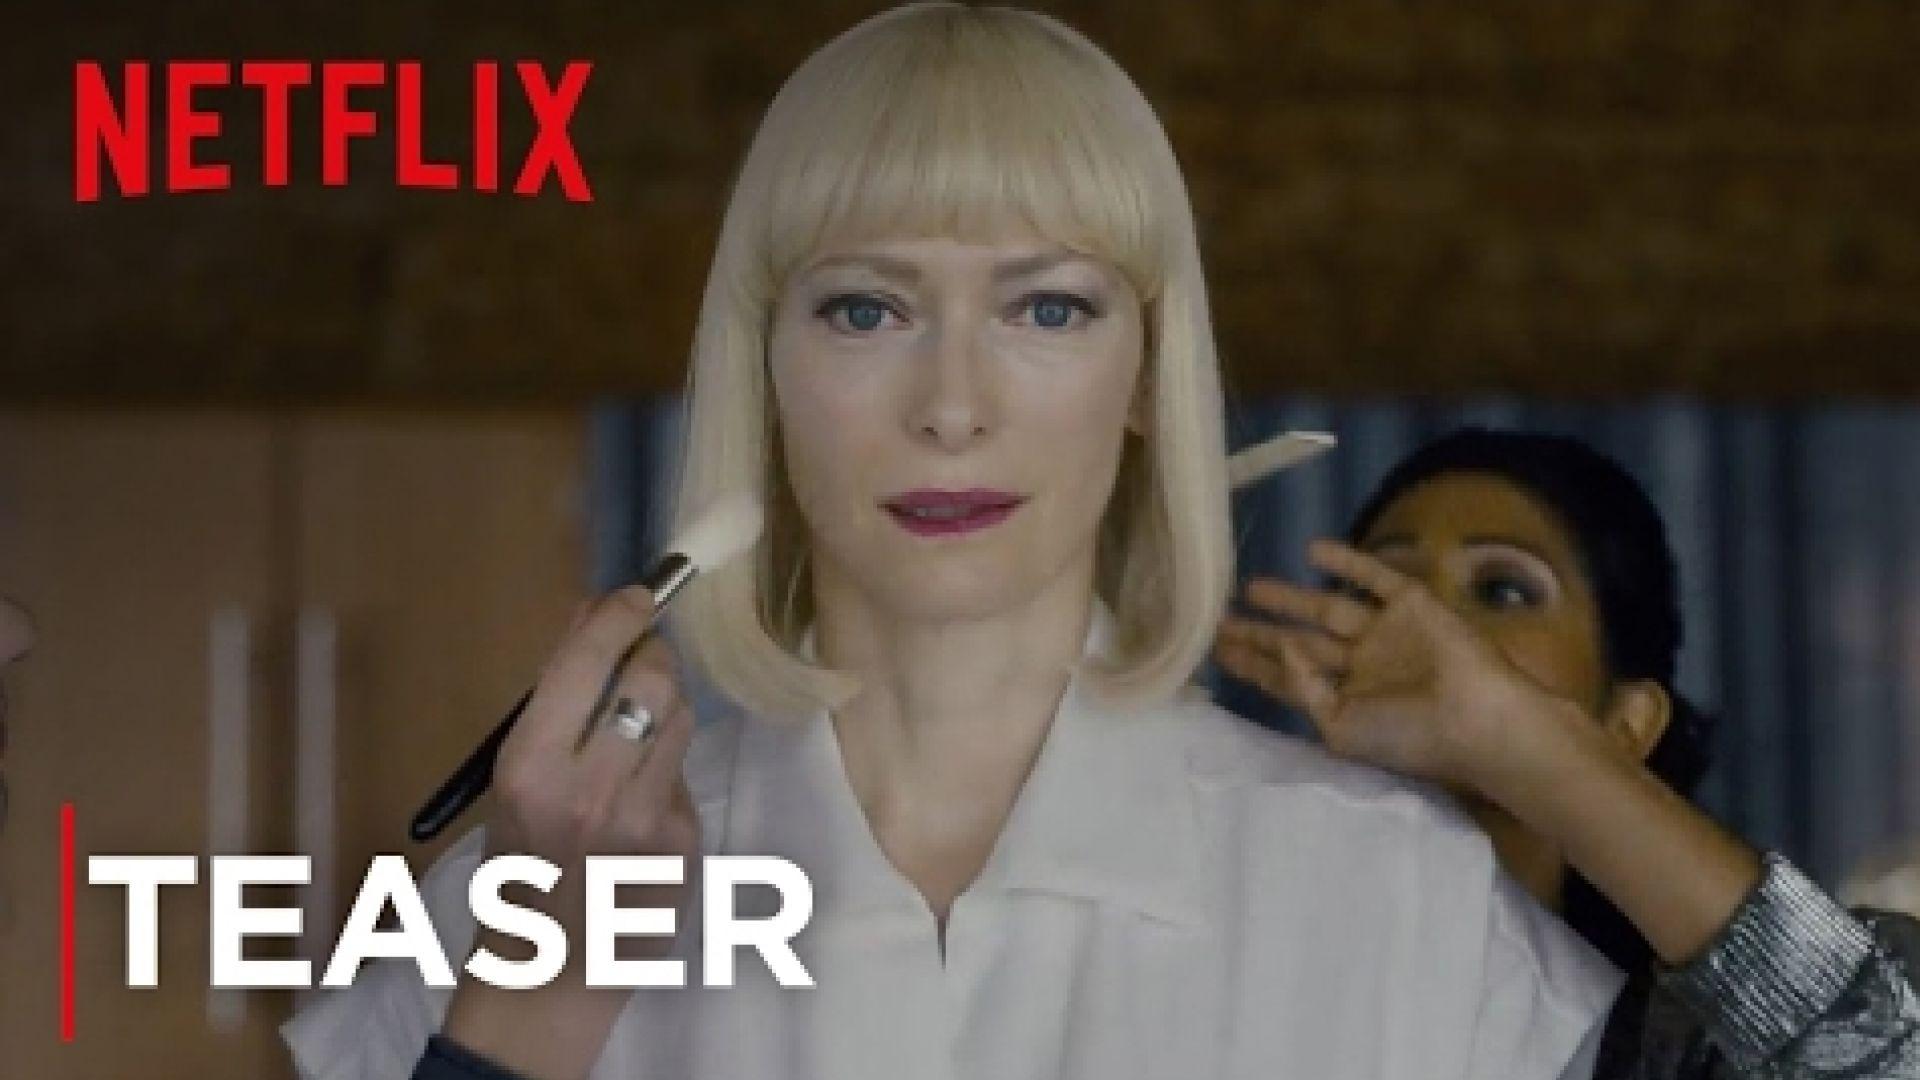 'Okja' Teaser Trailer with Tilda Swinton and Jake Gyllenhaal